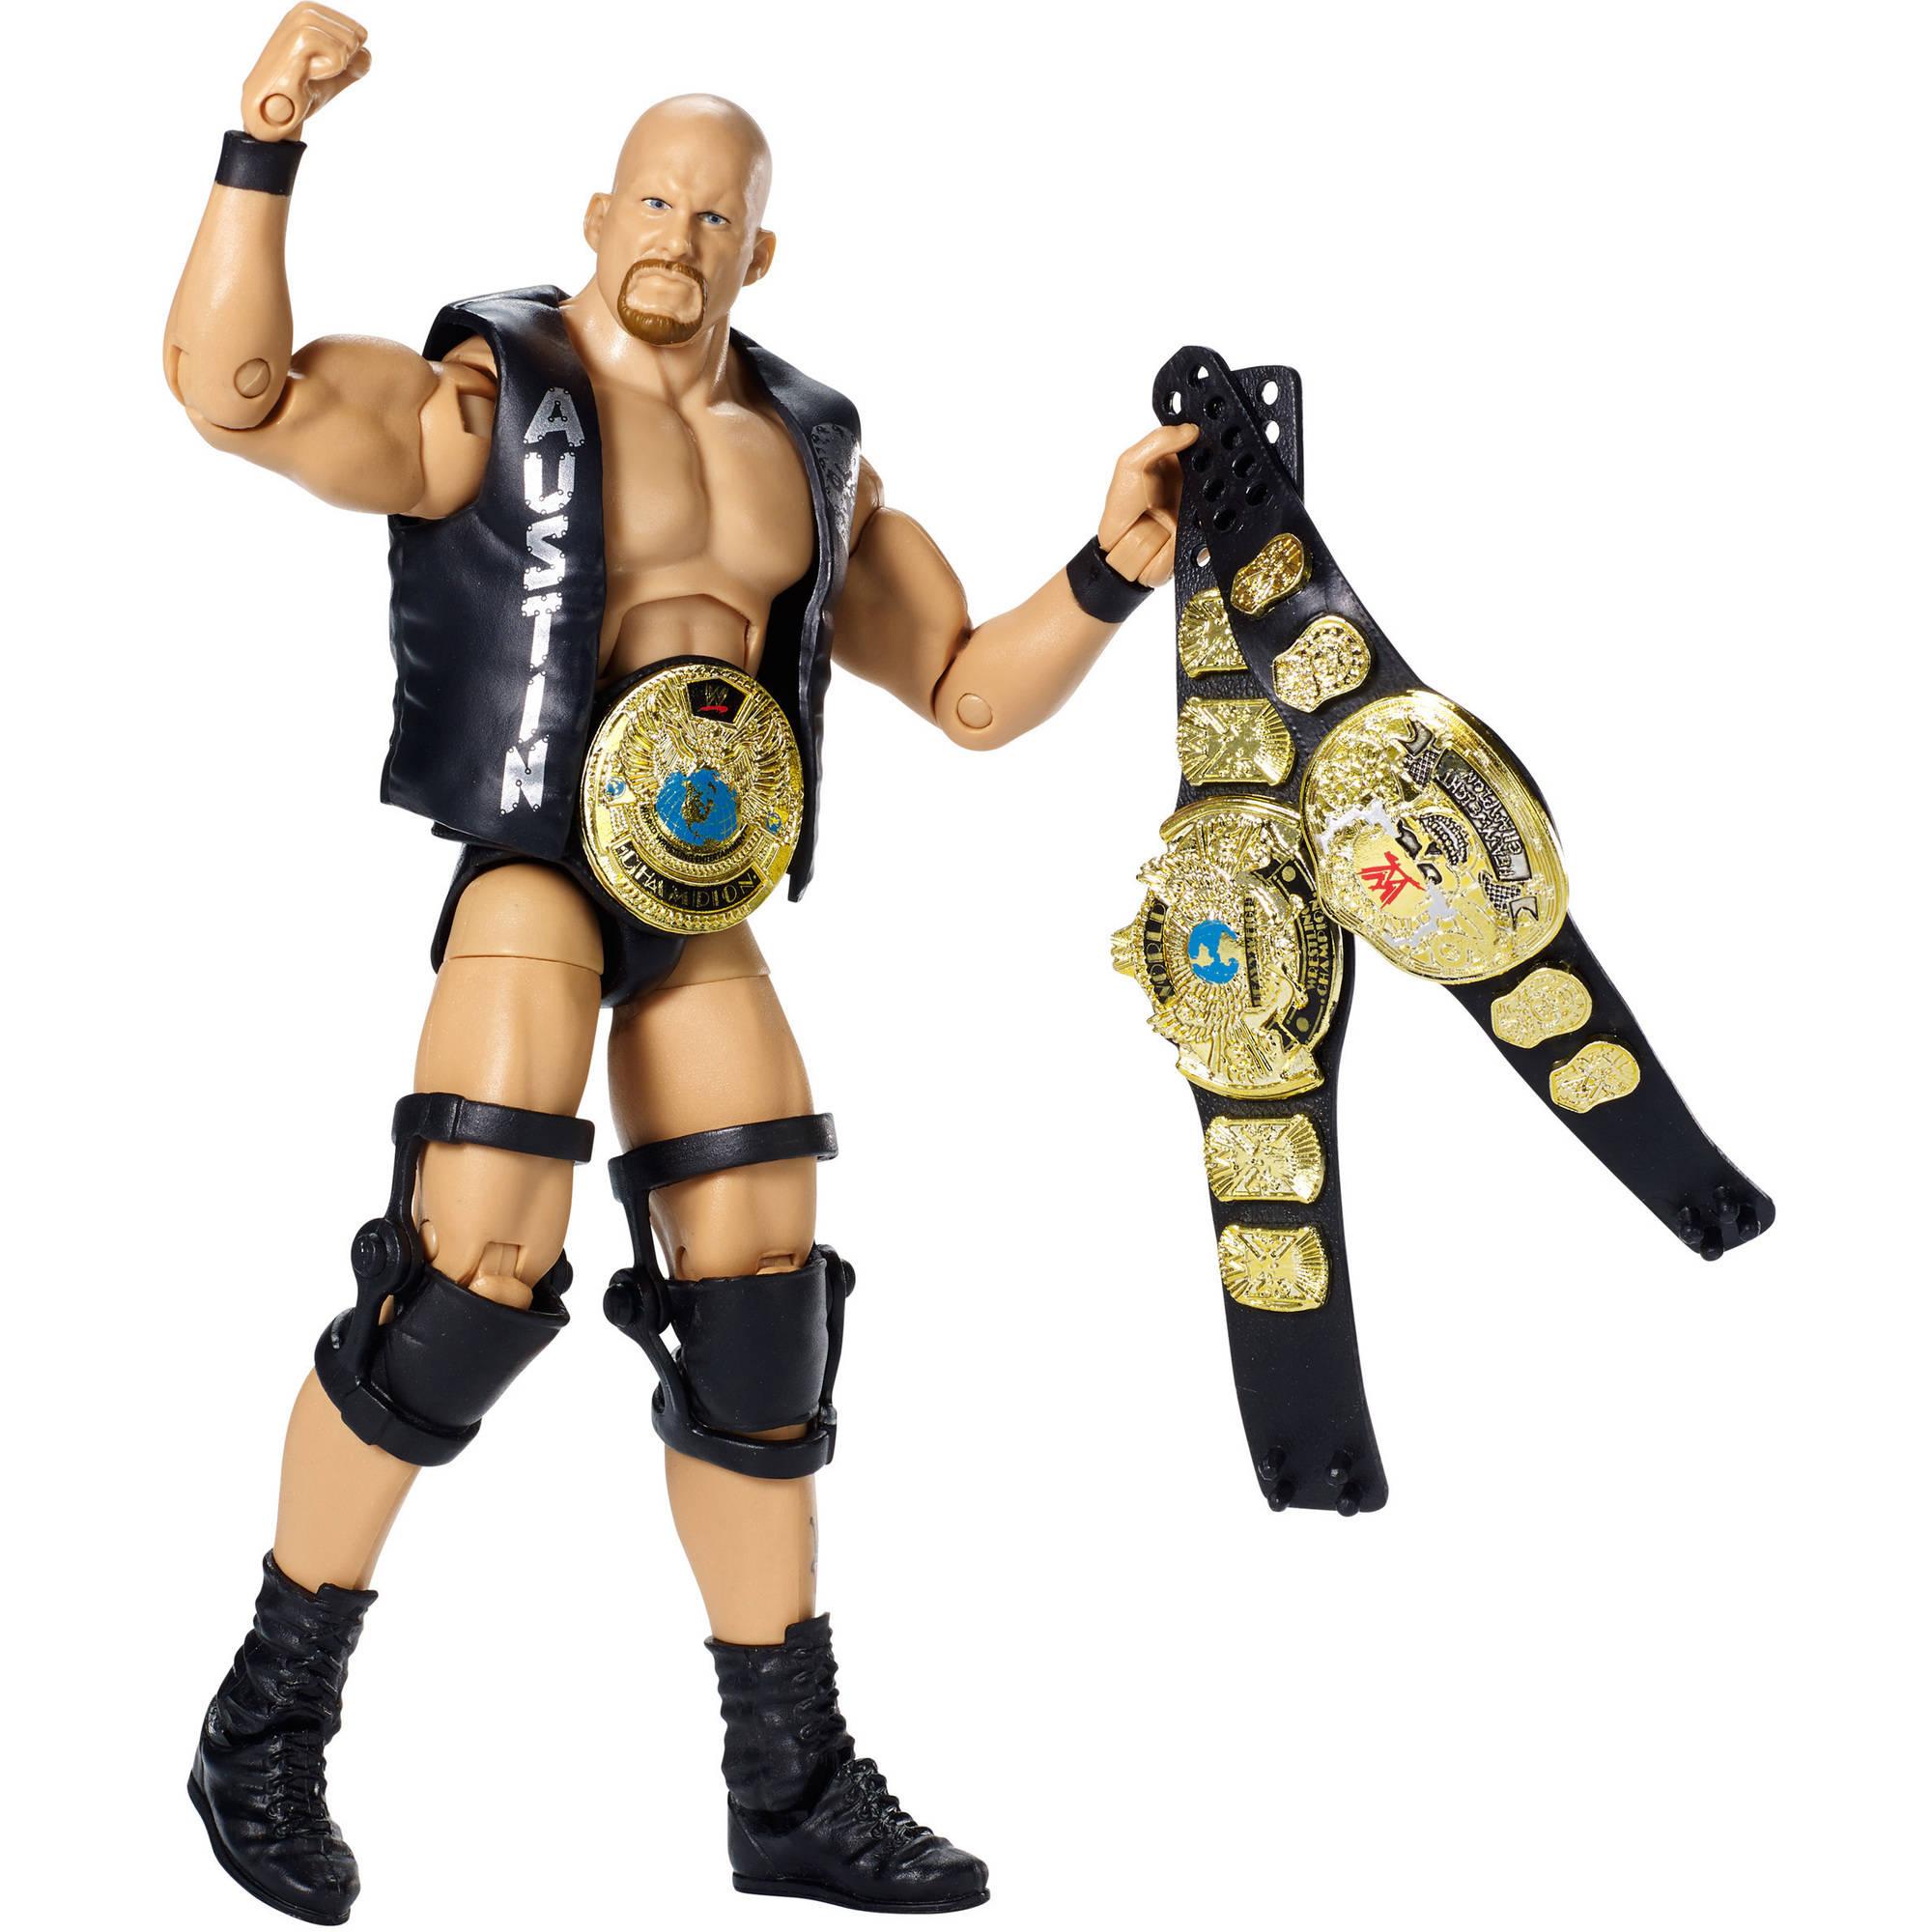 WWE Defining Moments Elite Stone Cold Steve Austin Figure